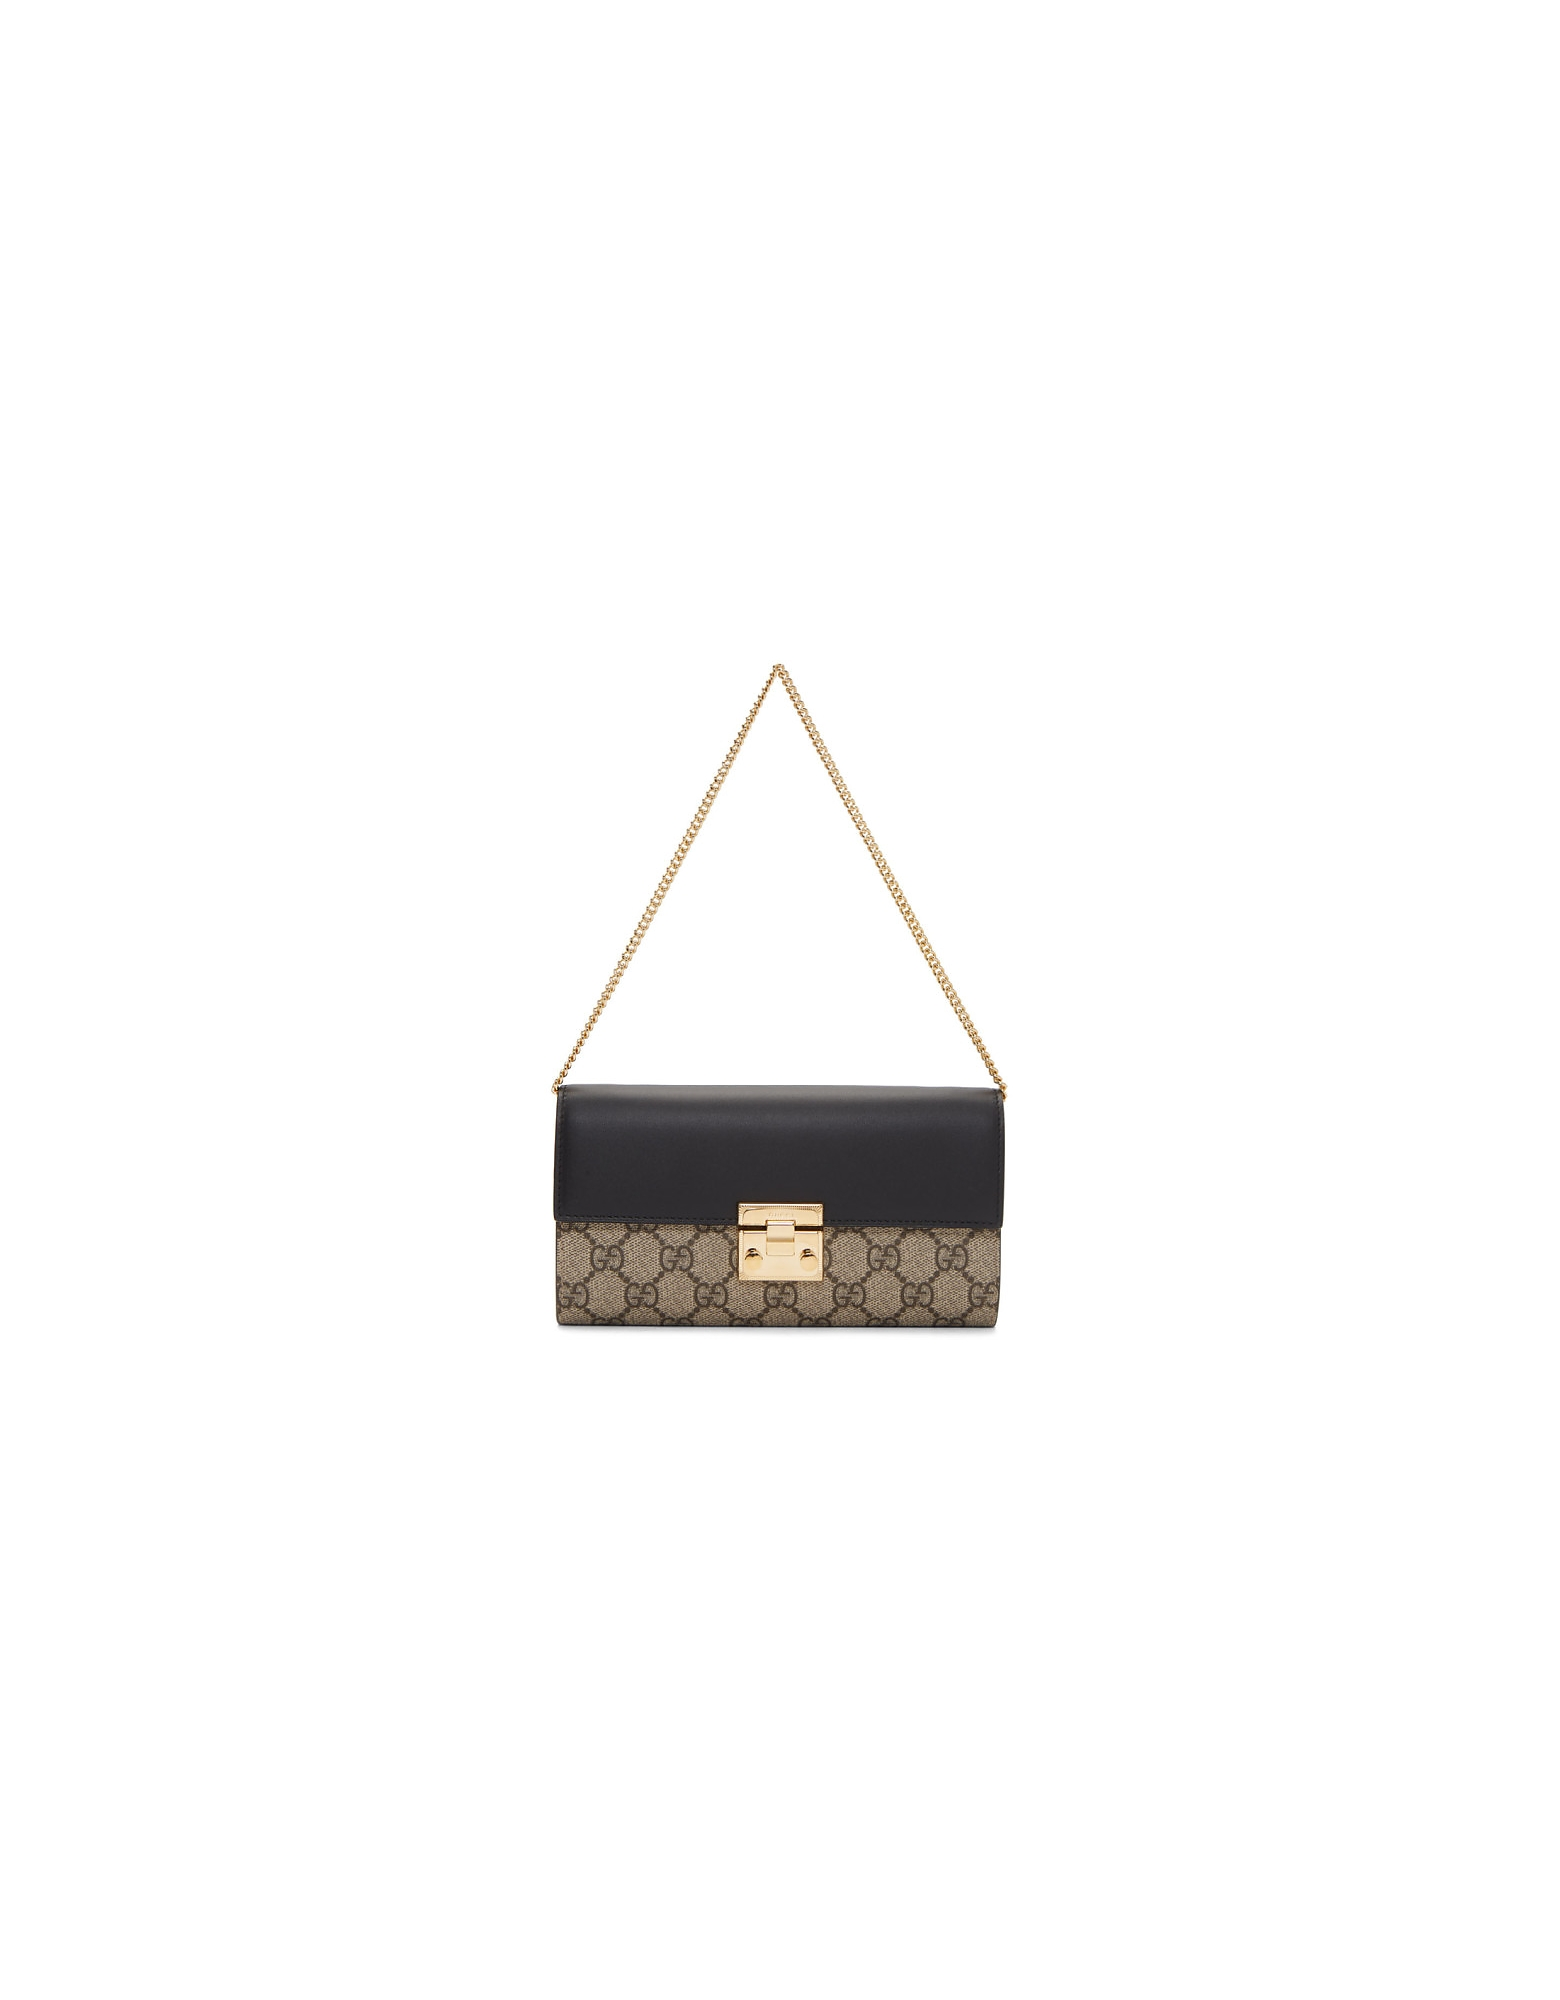 Gucci Designer Handbags, Beige and Black Padlock GG Wallet Bag